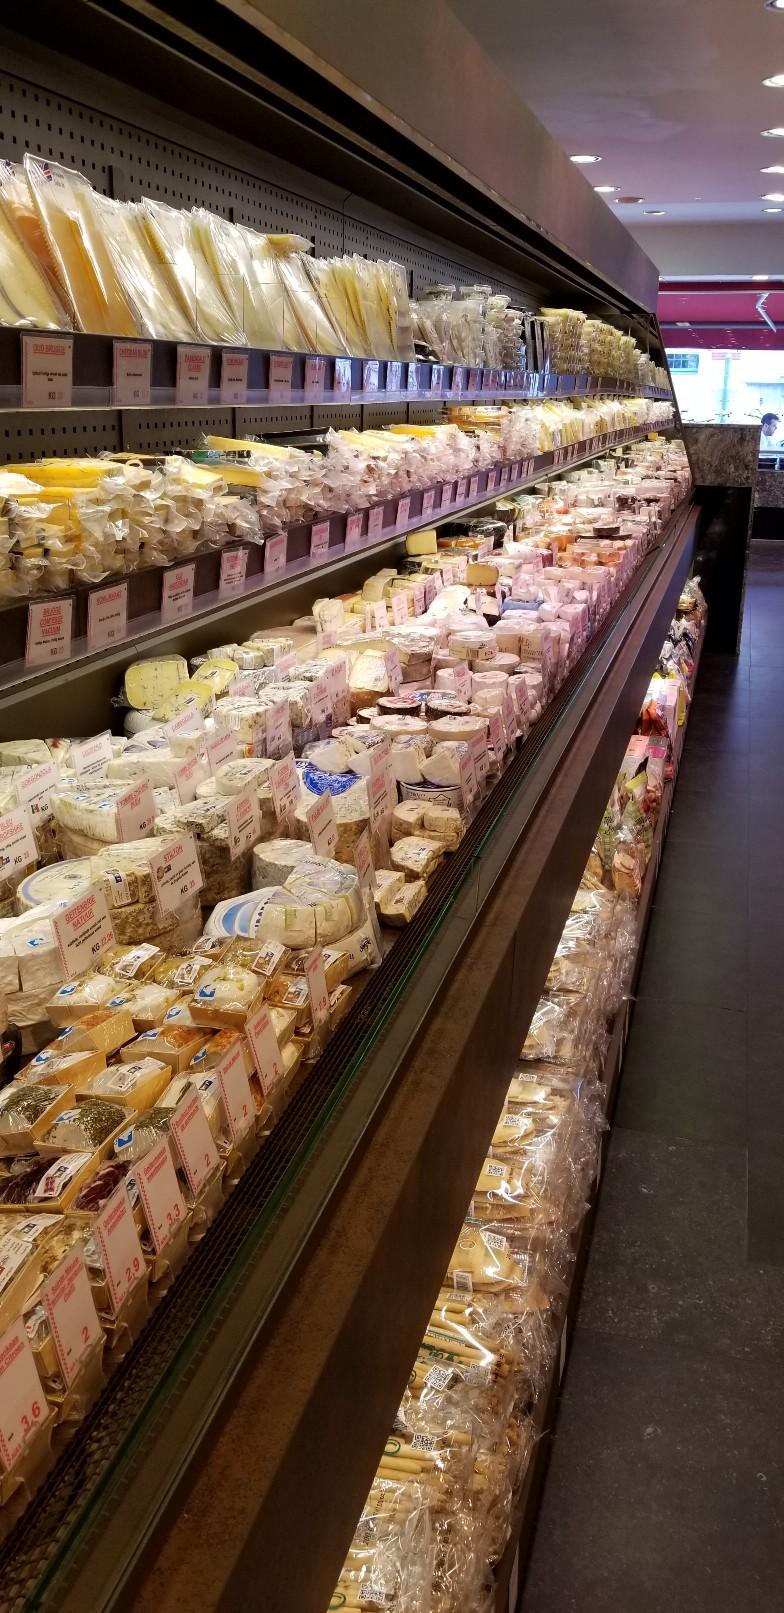 European Supermarket Cheese Case